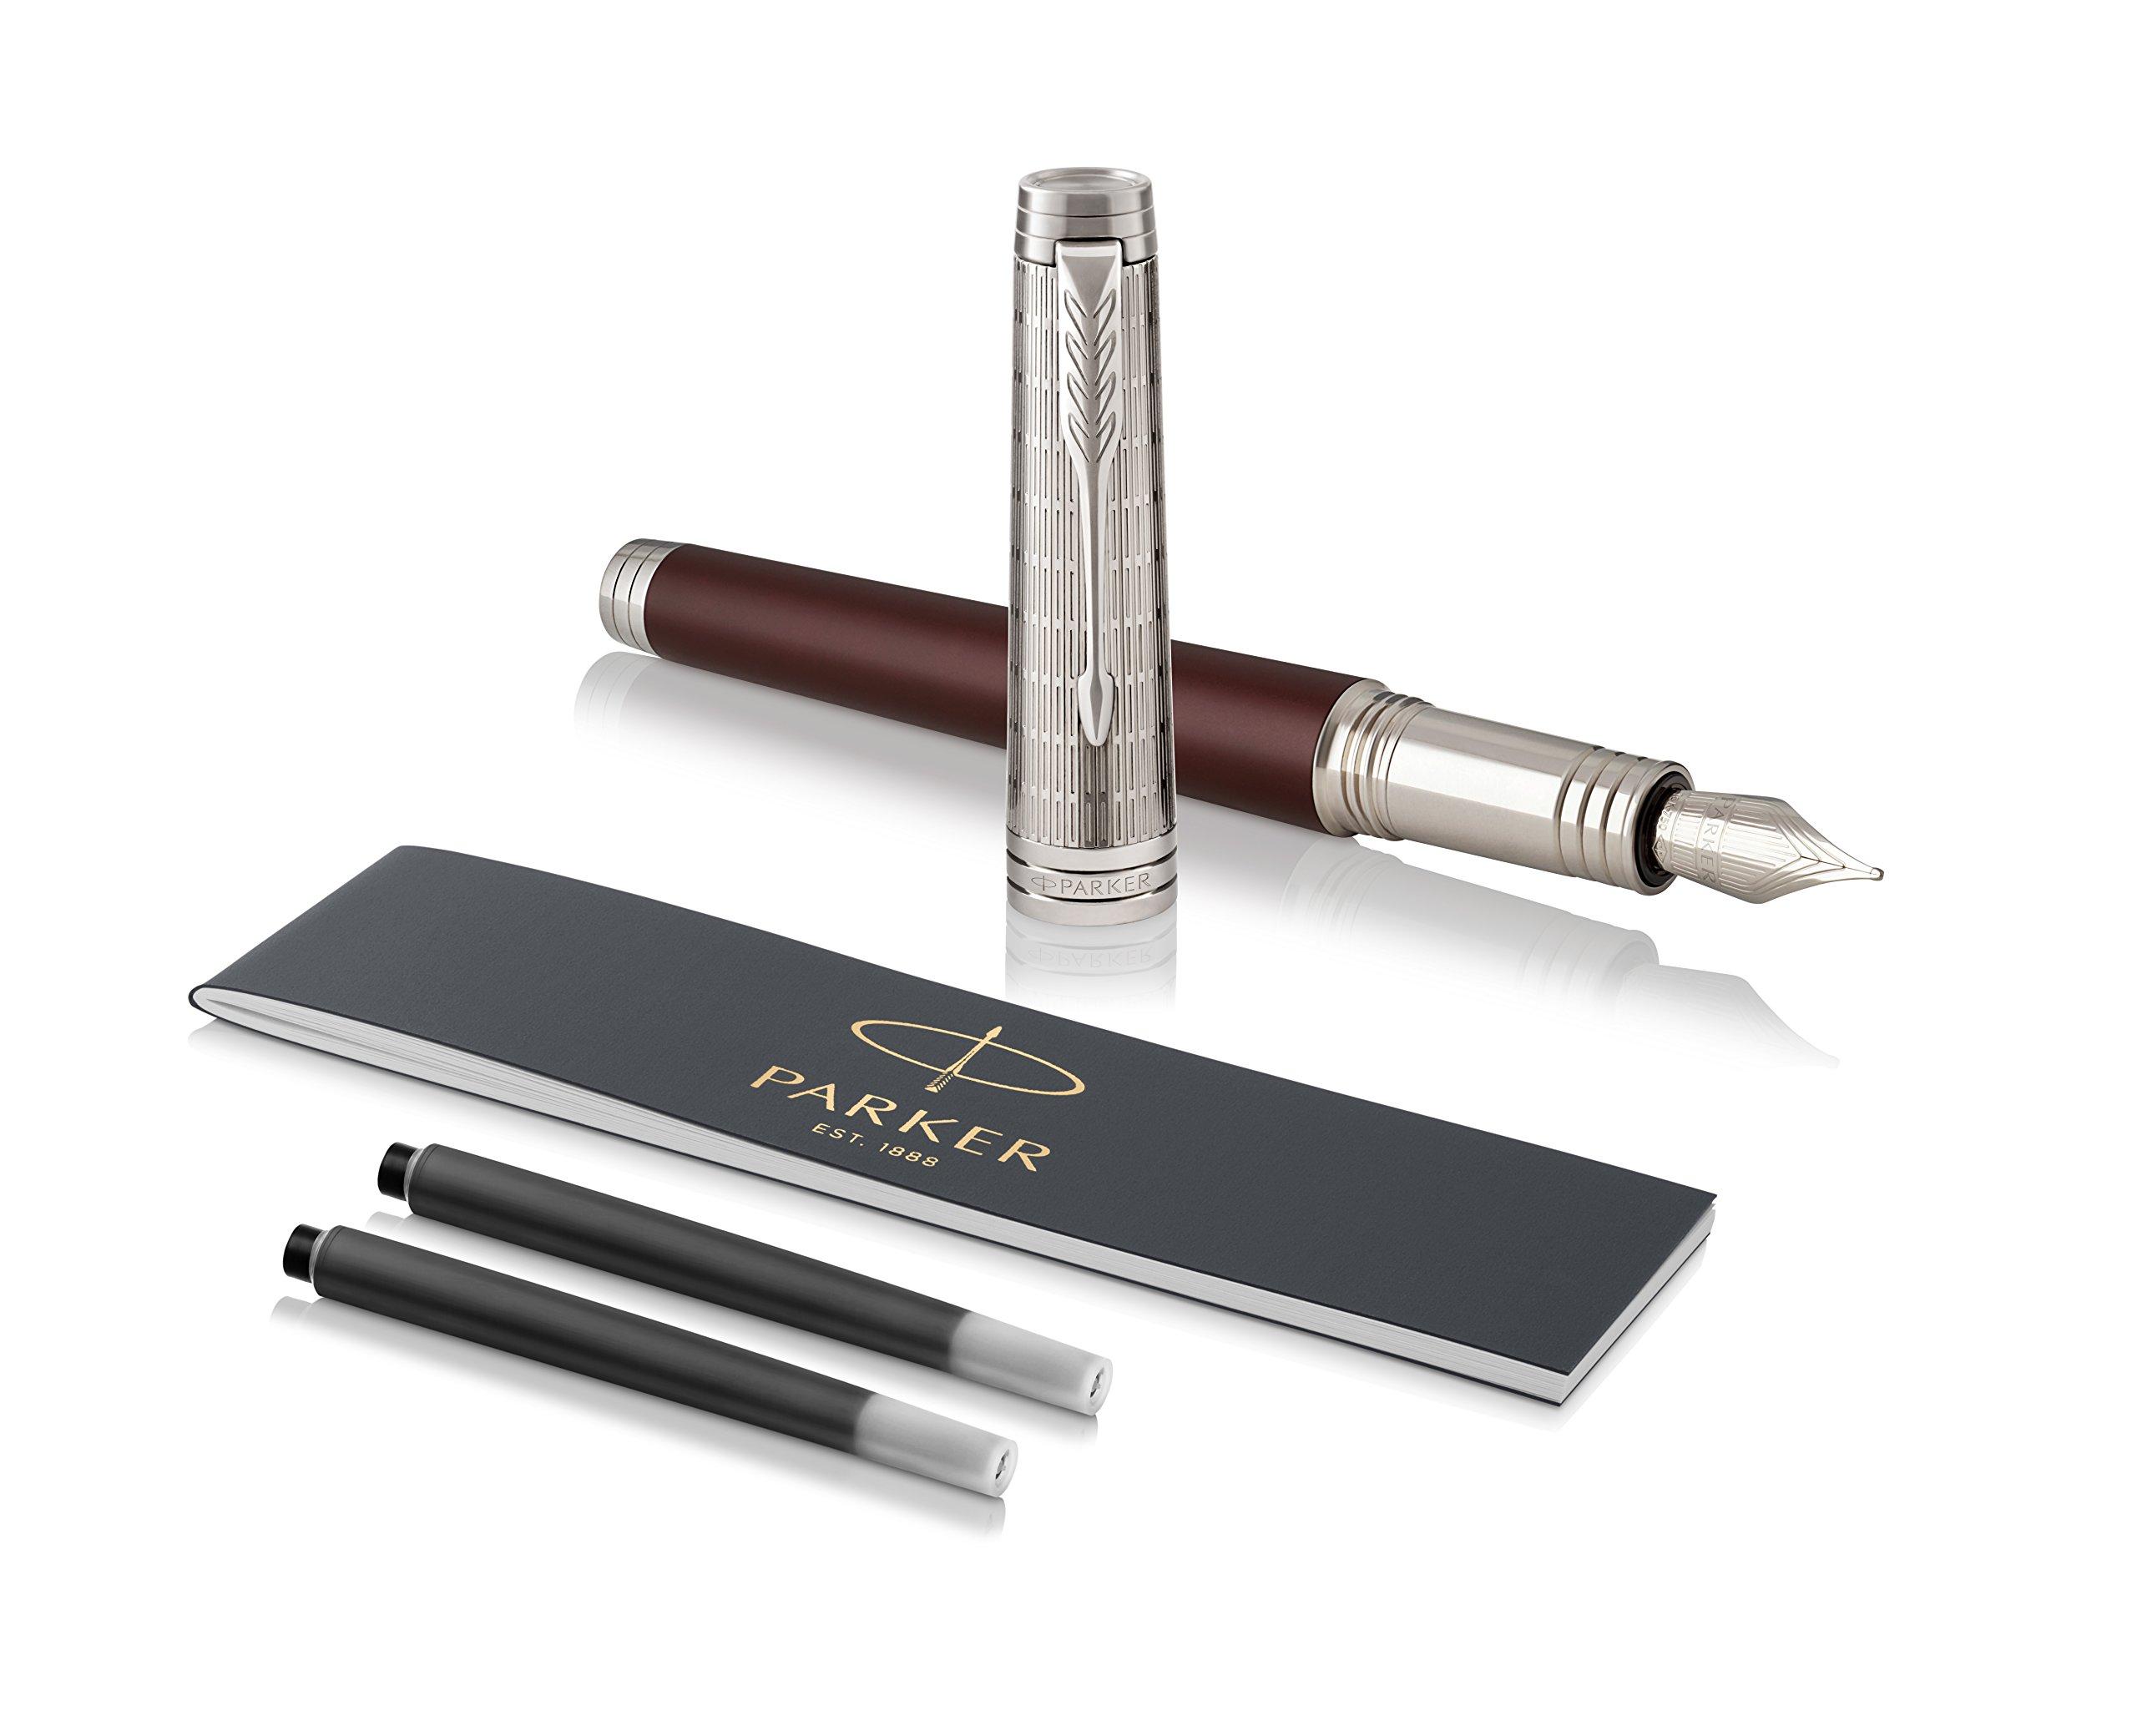 PARKER Premier Fountain Pen, Custom Crimson Red, Fine Nib with Black Ink Refill